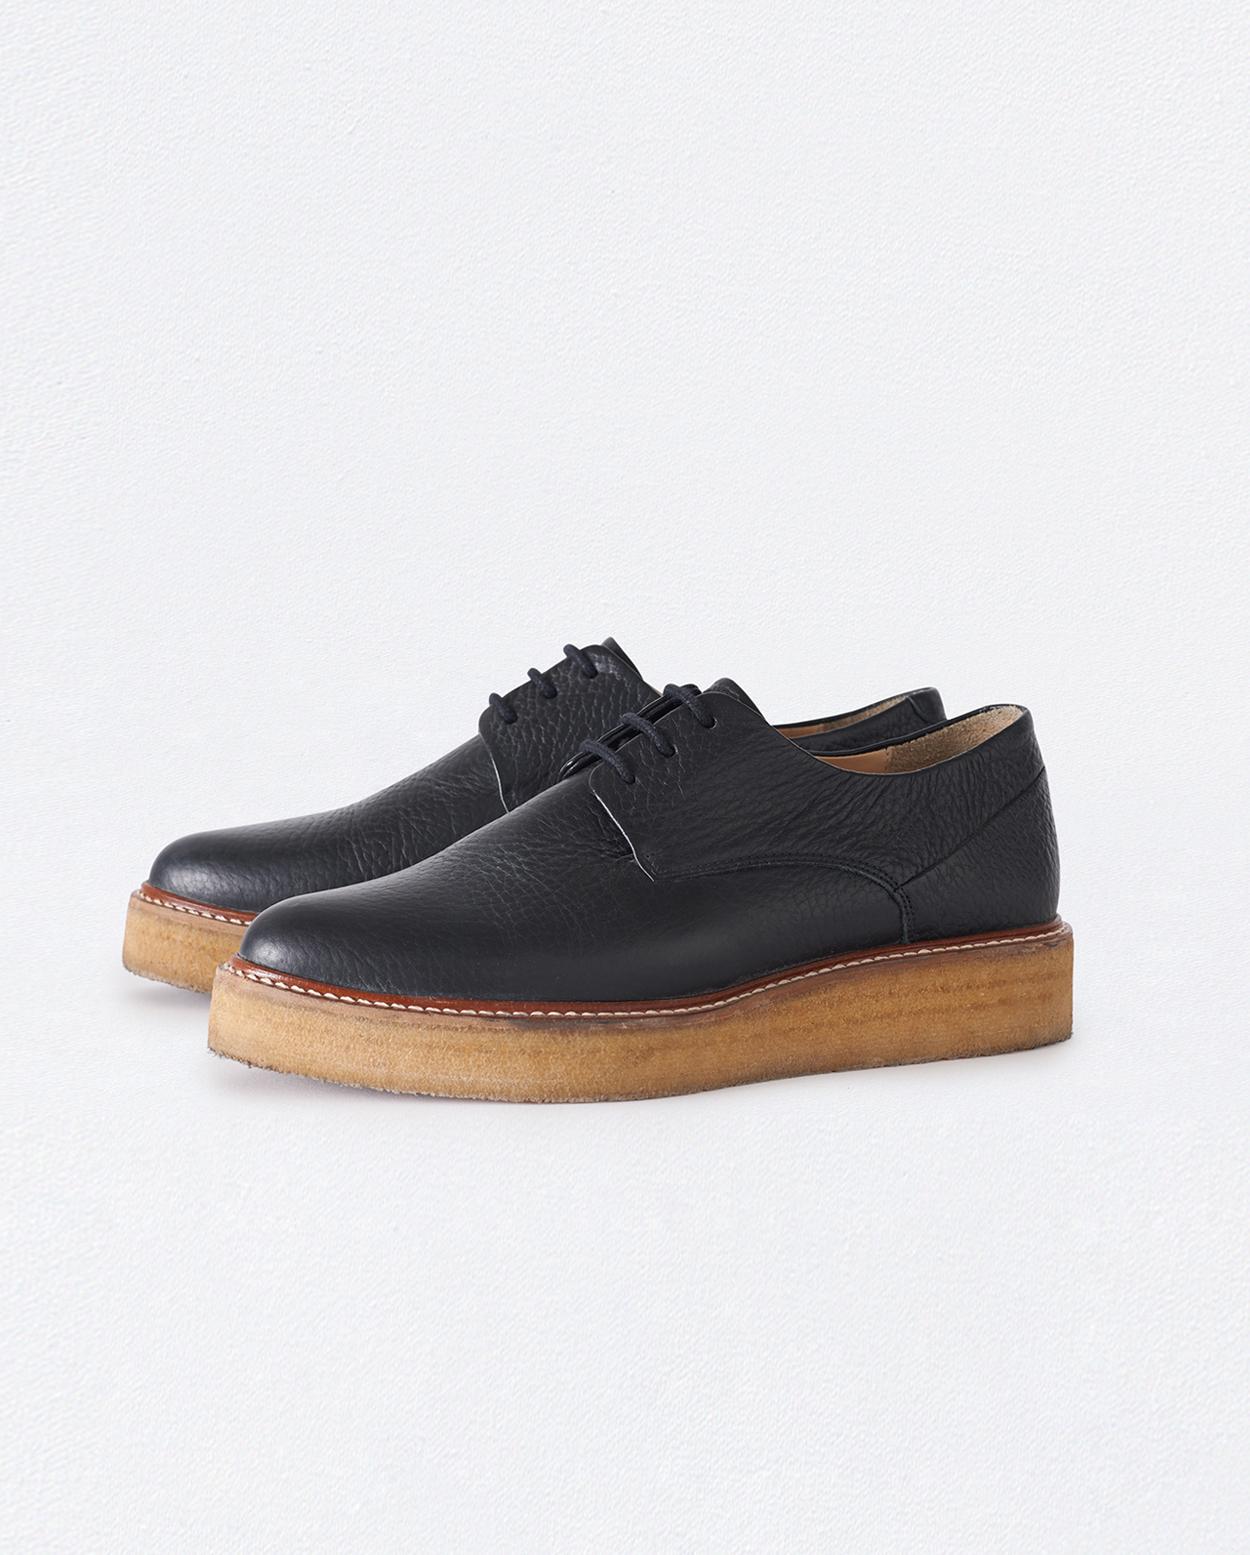 Poetry - Black crêpe sole lace-up shoes